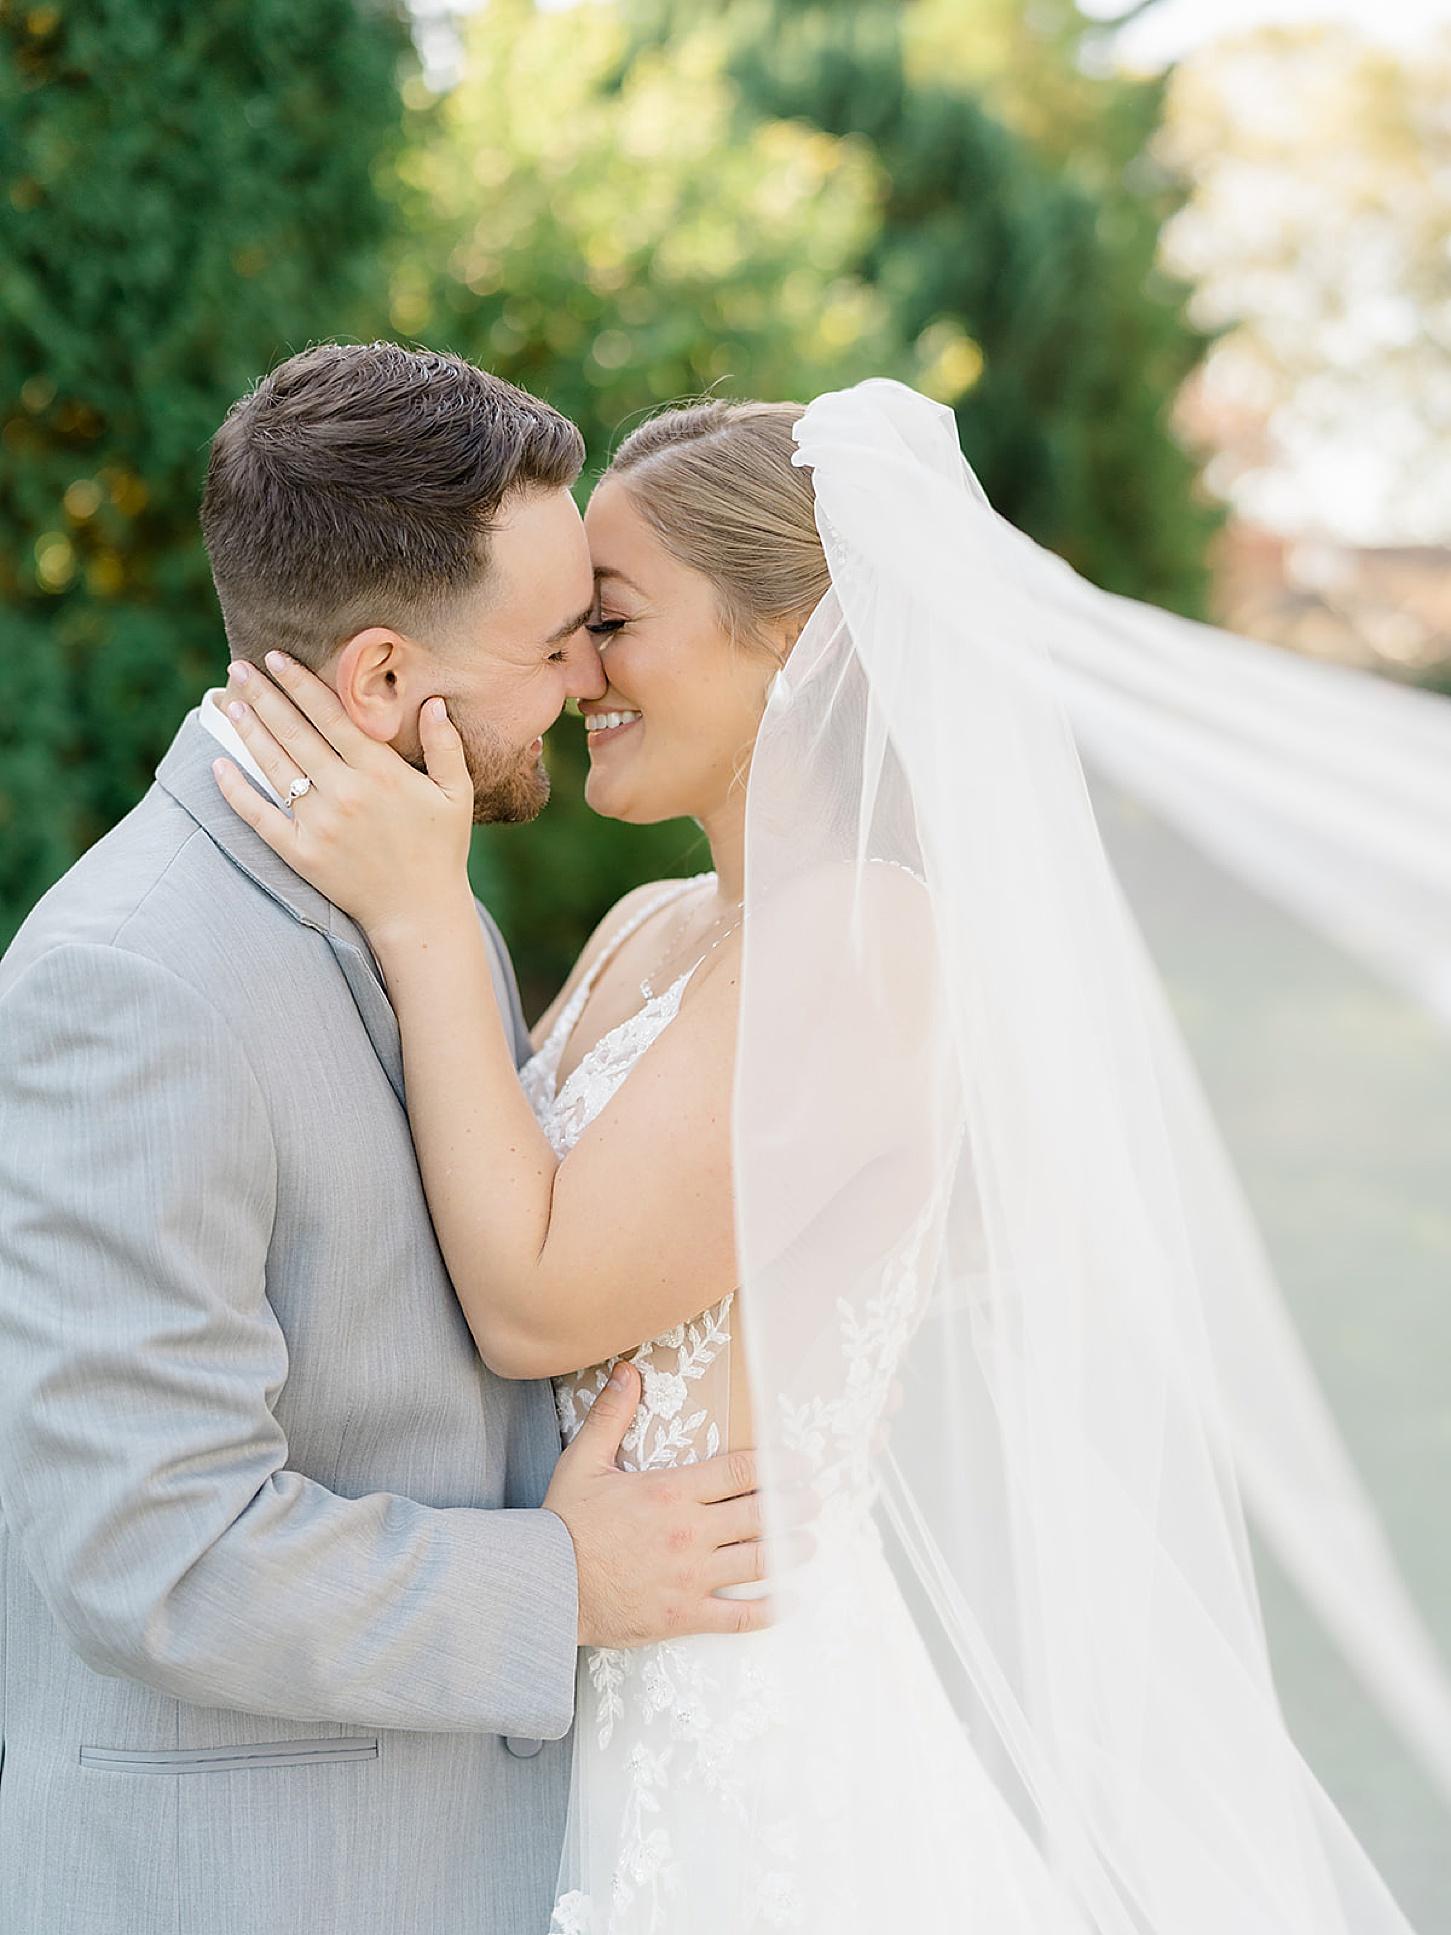 Valenzano Winery Vitners Pavillion Wedding Photography by Magdalena Studios 0009